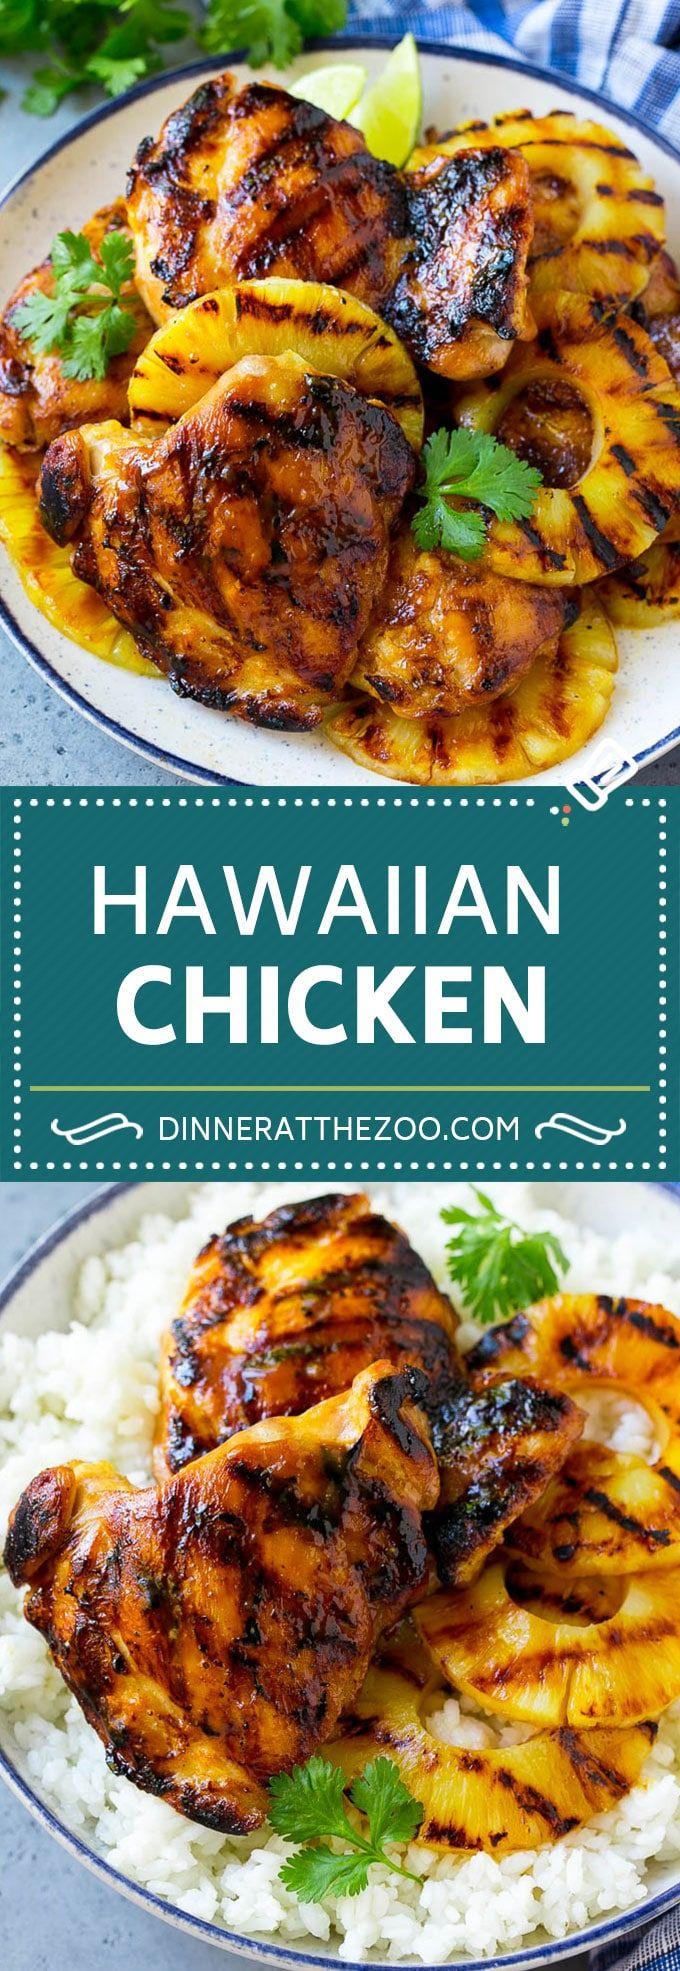 Hawaiian Chicken Recipe | Grilled Chicken | Pineapple Chicken #chicken #grilling #dinner #pineapple #dinneratthezoo #hawaiianfoodrecipes